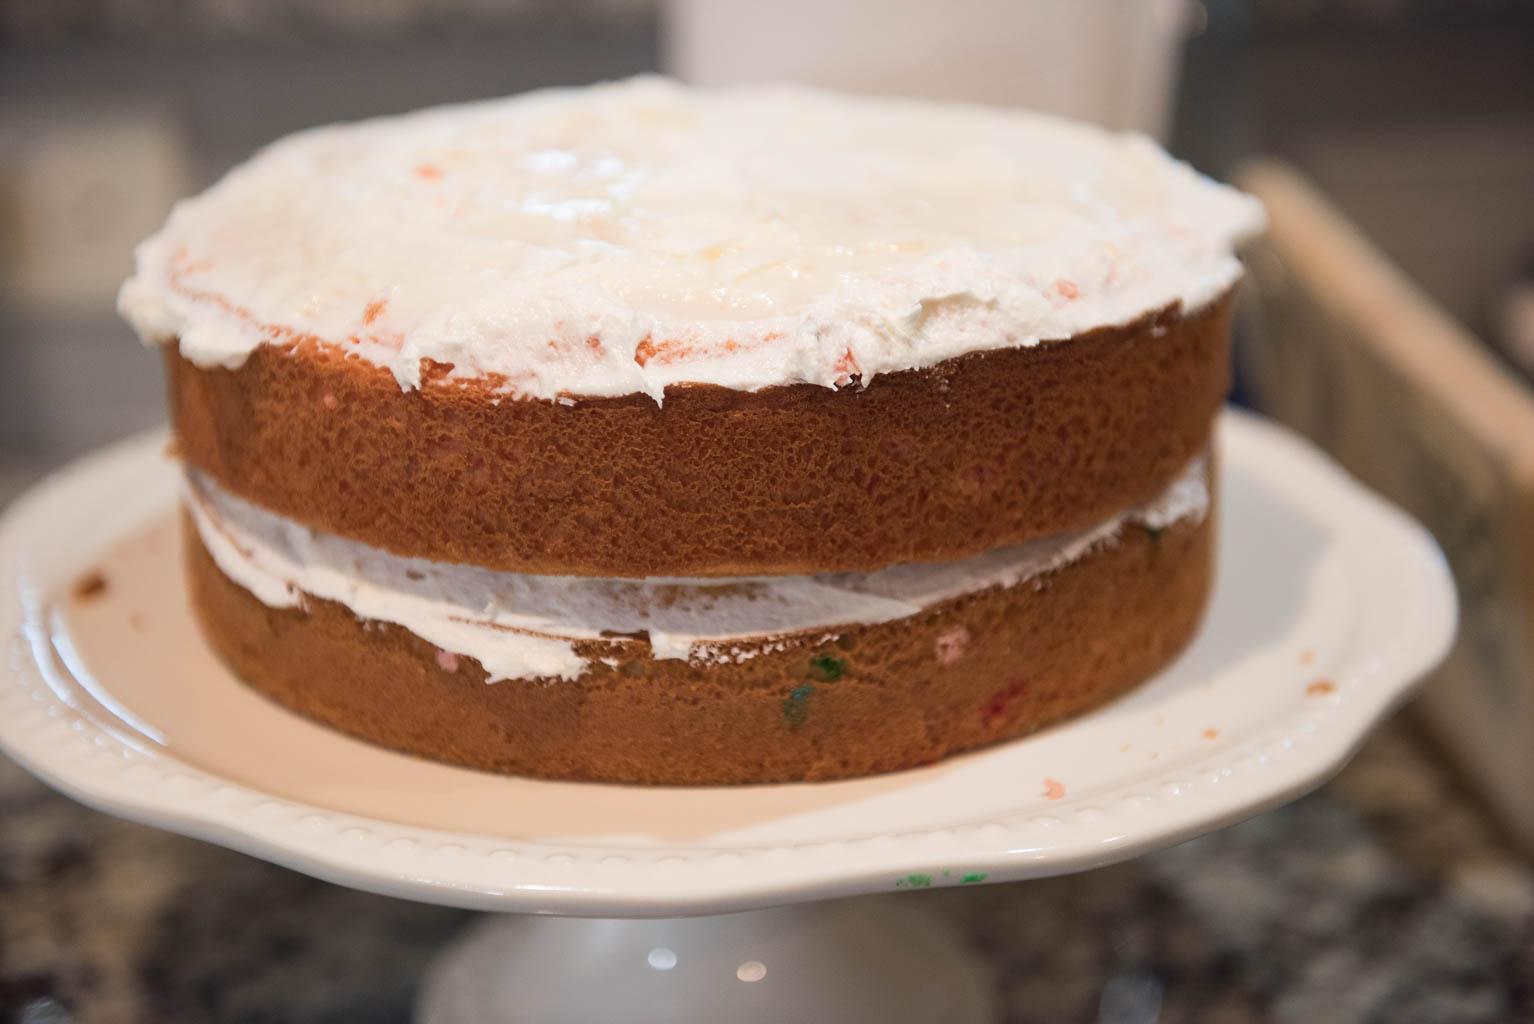 cake-howto-11.jpg